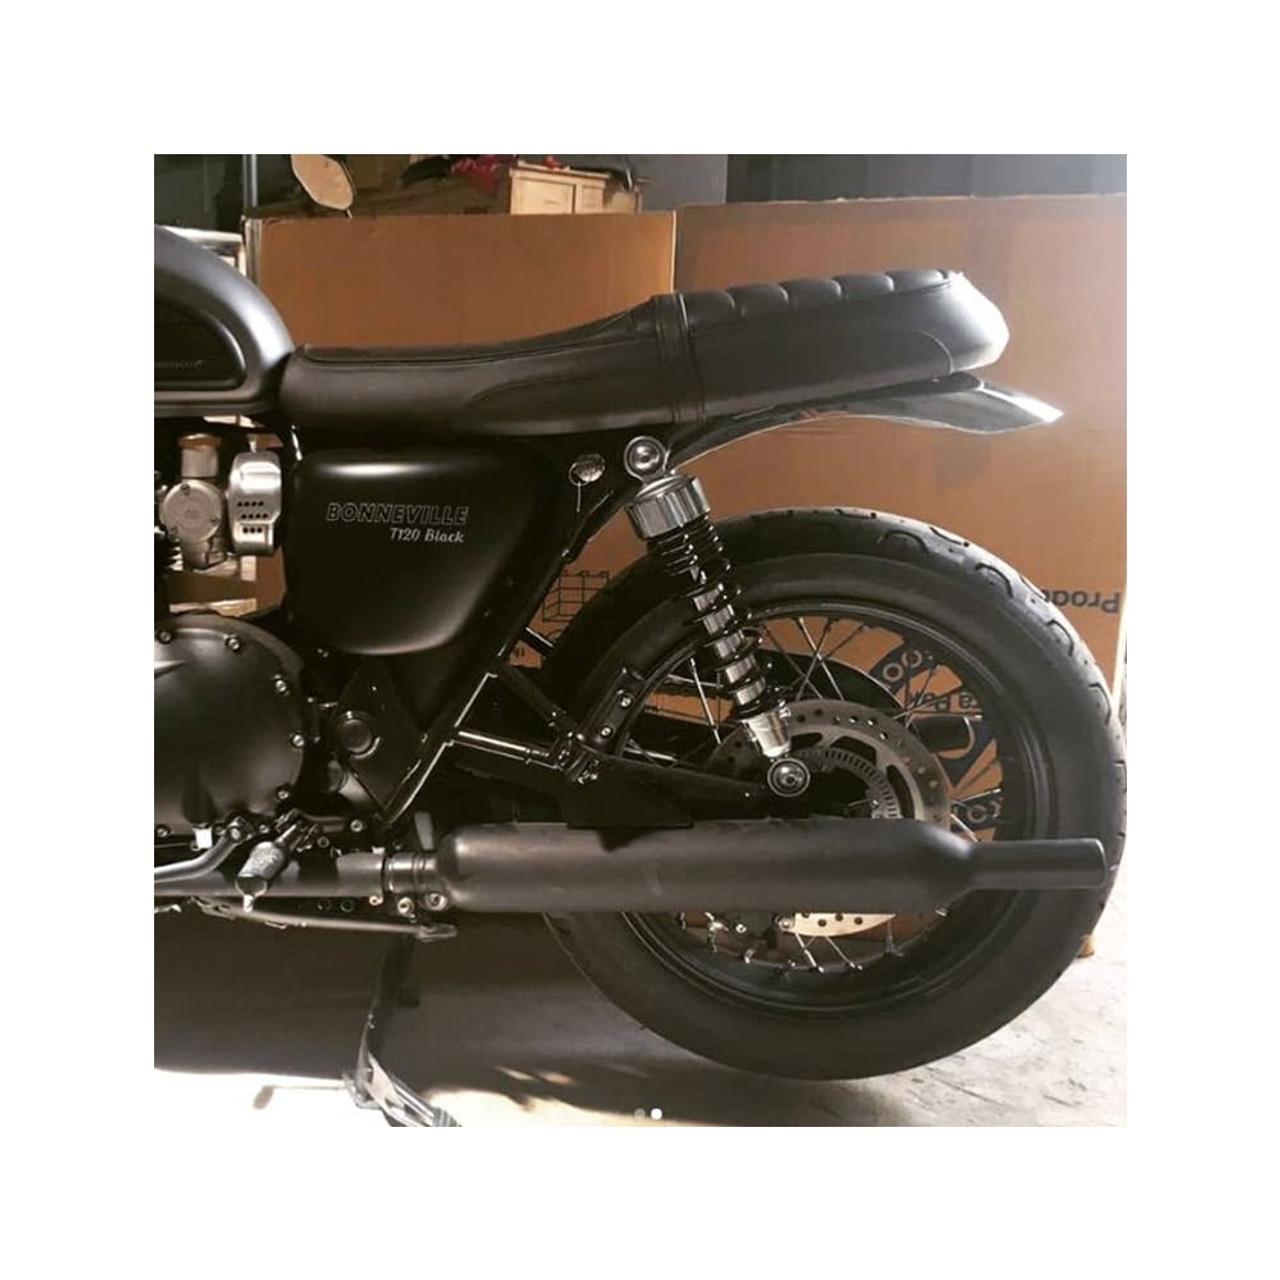 MOTONE Bobbed Rear Mudguard/Fender - Polished Aluminium - LC